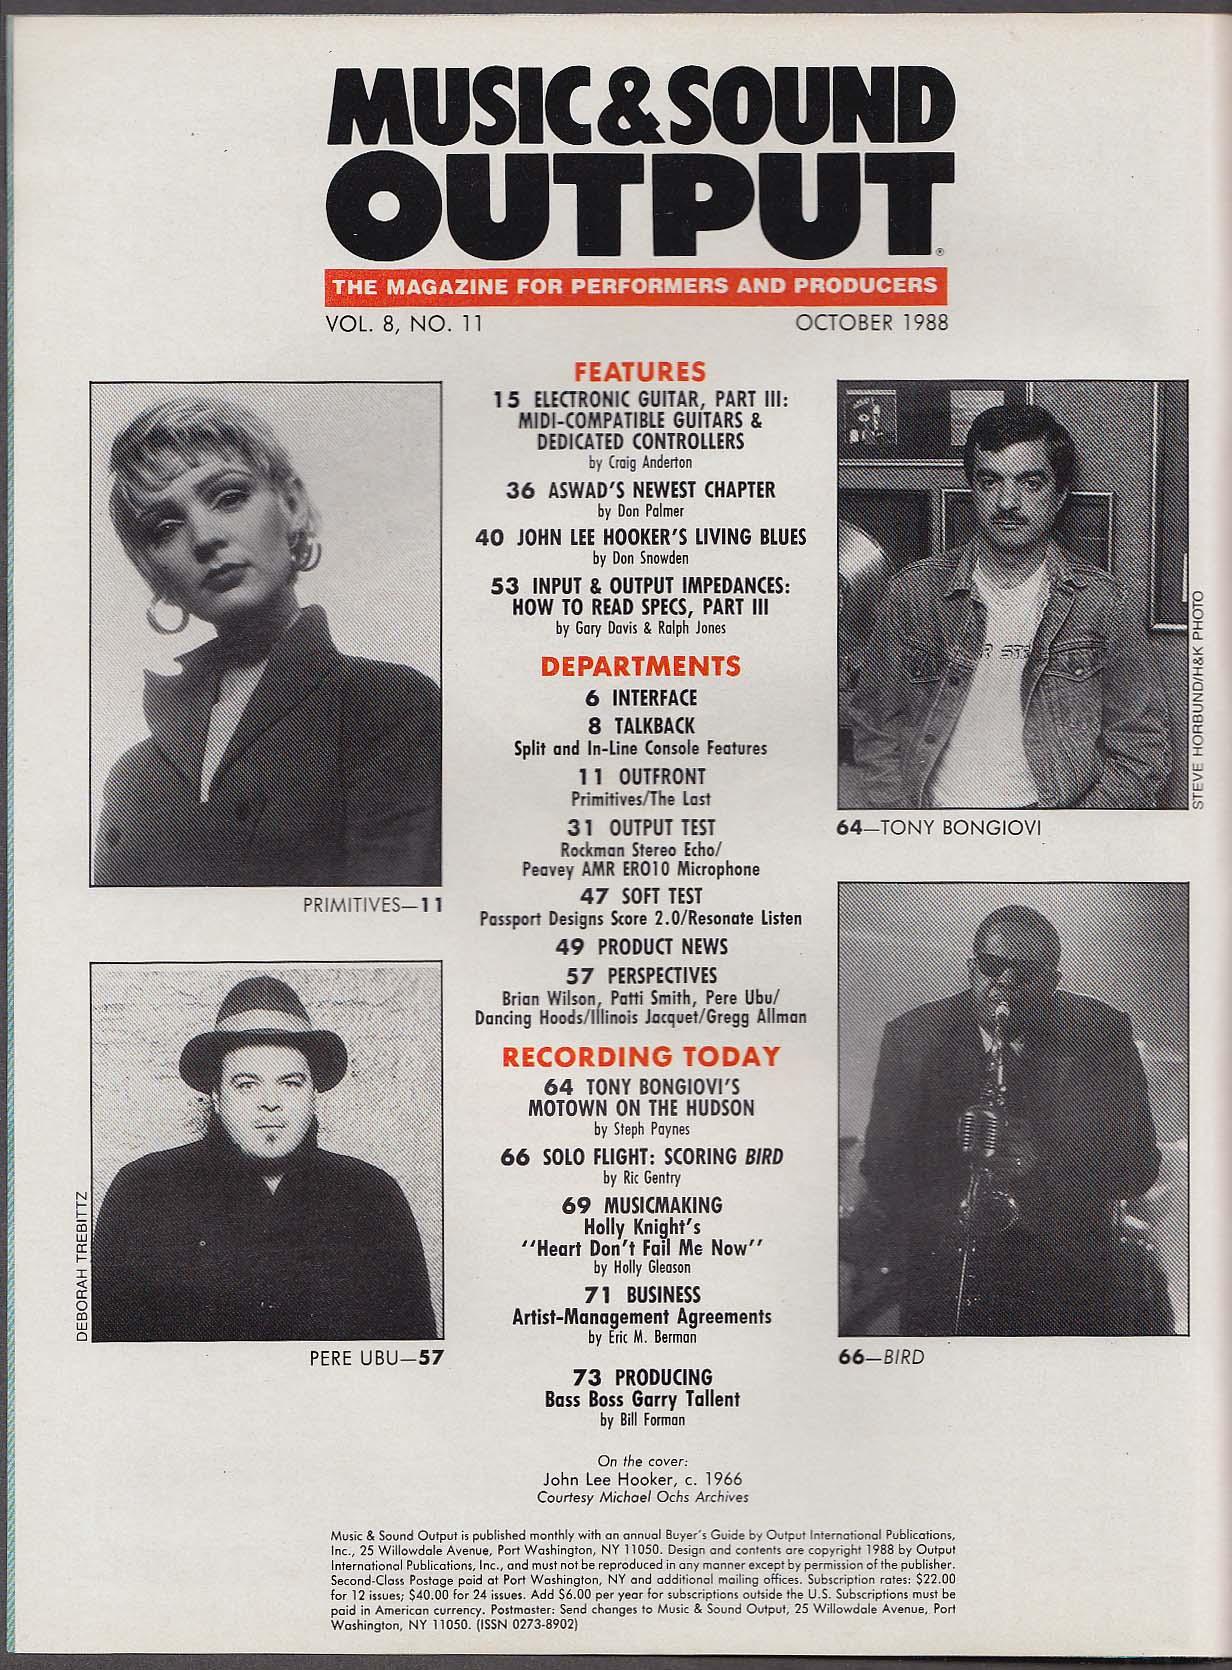 MUSIC & SOUND OUTPUT John Lee Hooker Tony Bongiovi Bird Primitives ++ 10 1988